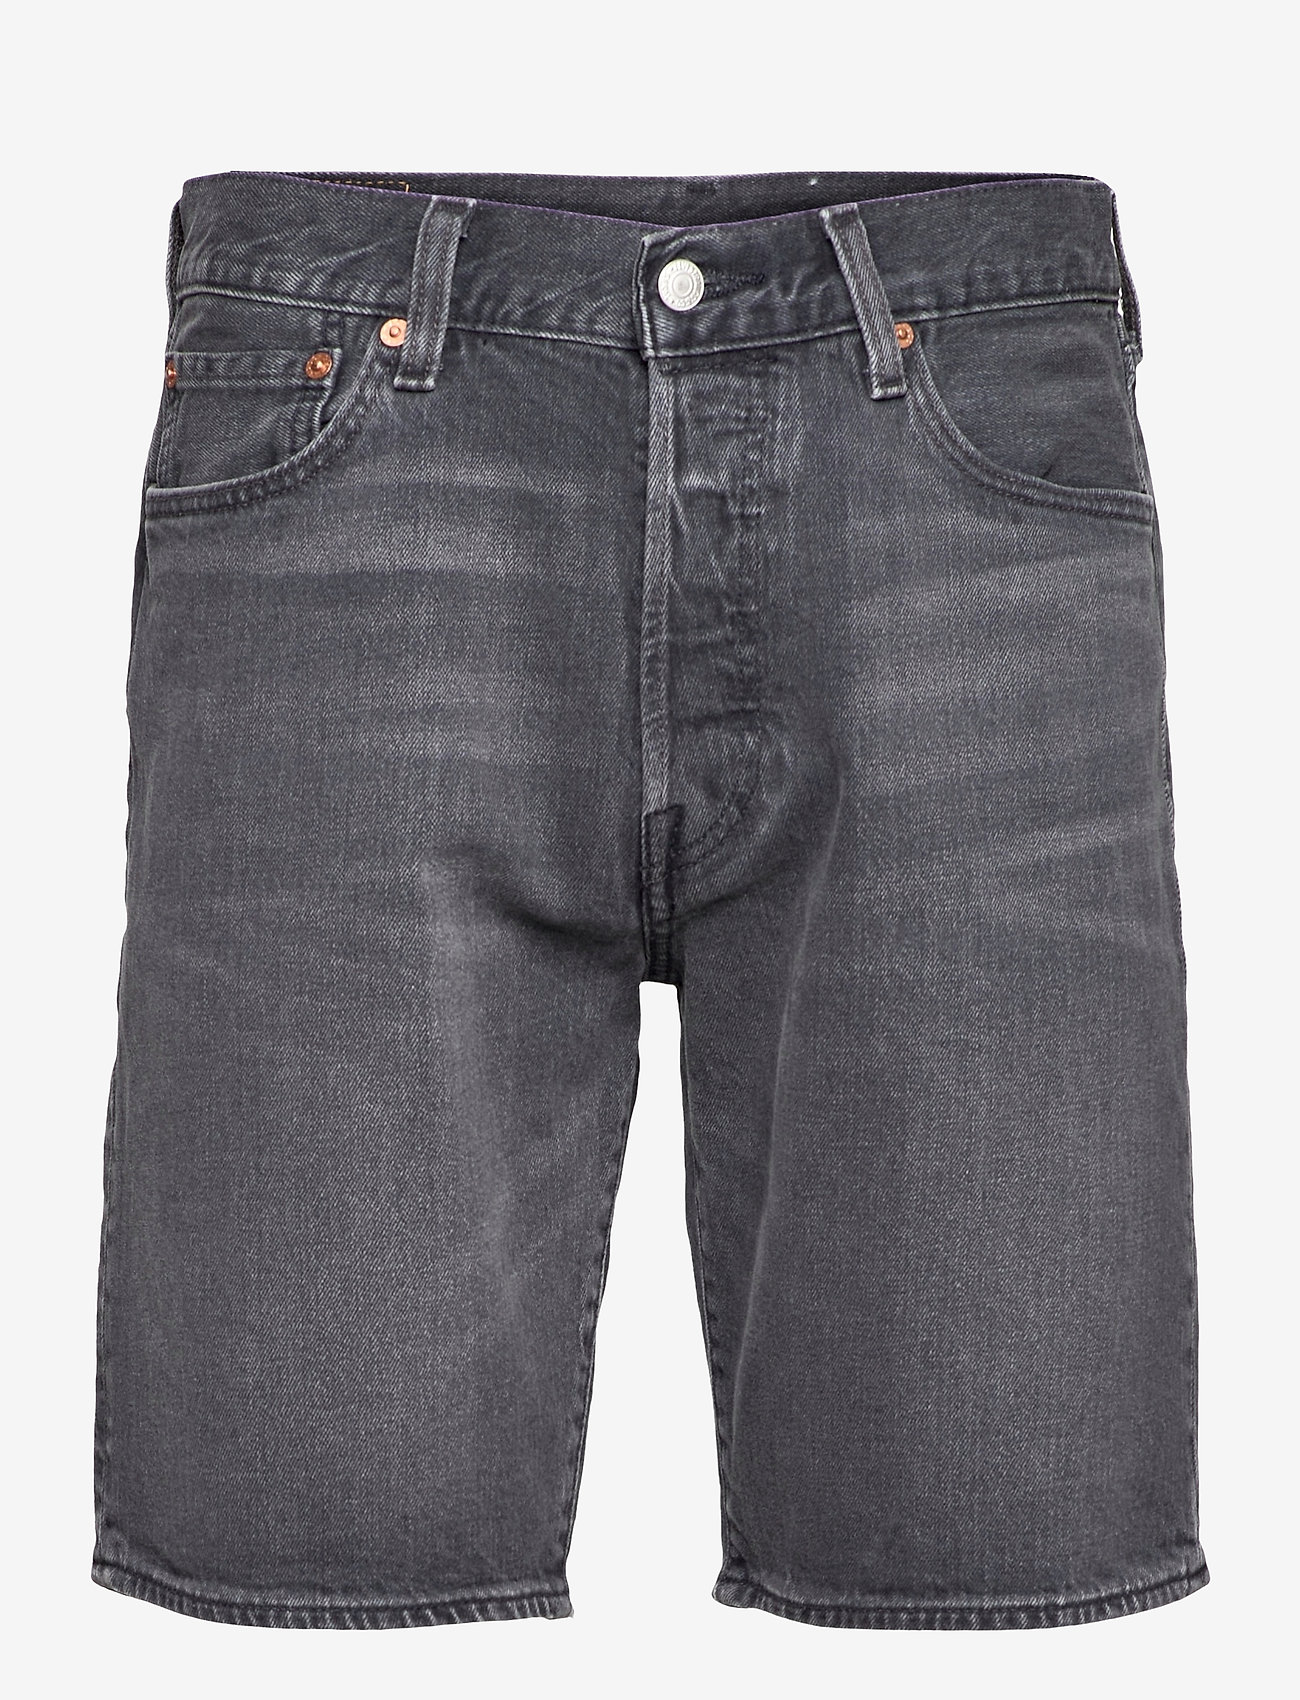 LEVI´S Men - 501 HEMMED SHORT ITS NOT TIME - jeansowe szorty - blacks - 0